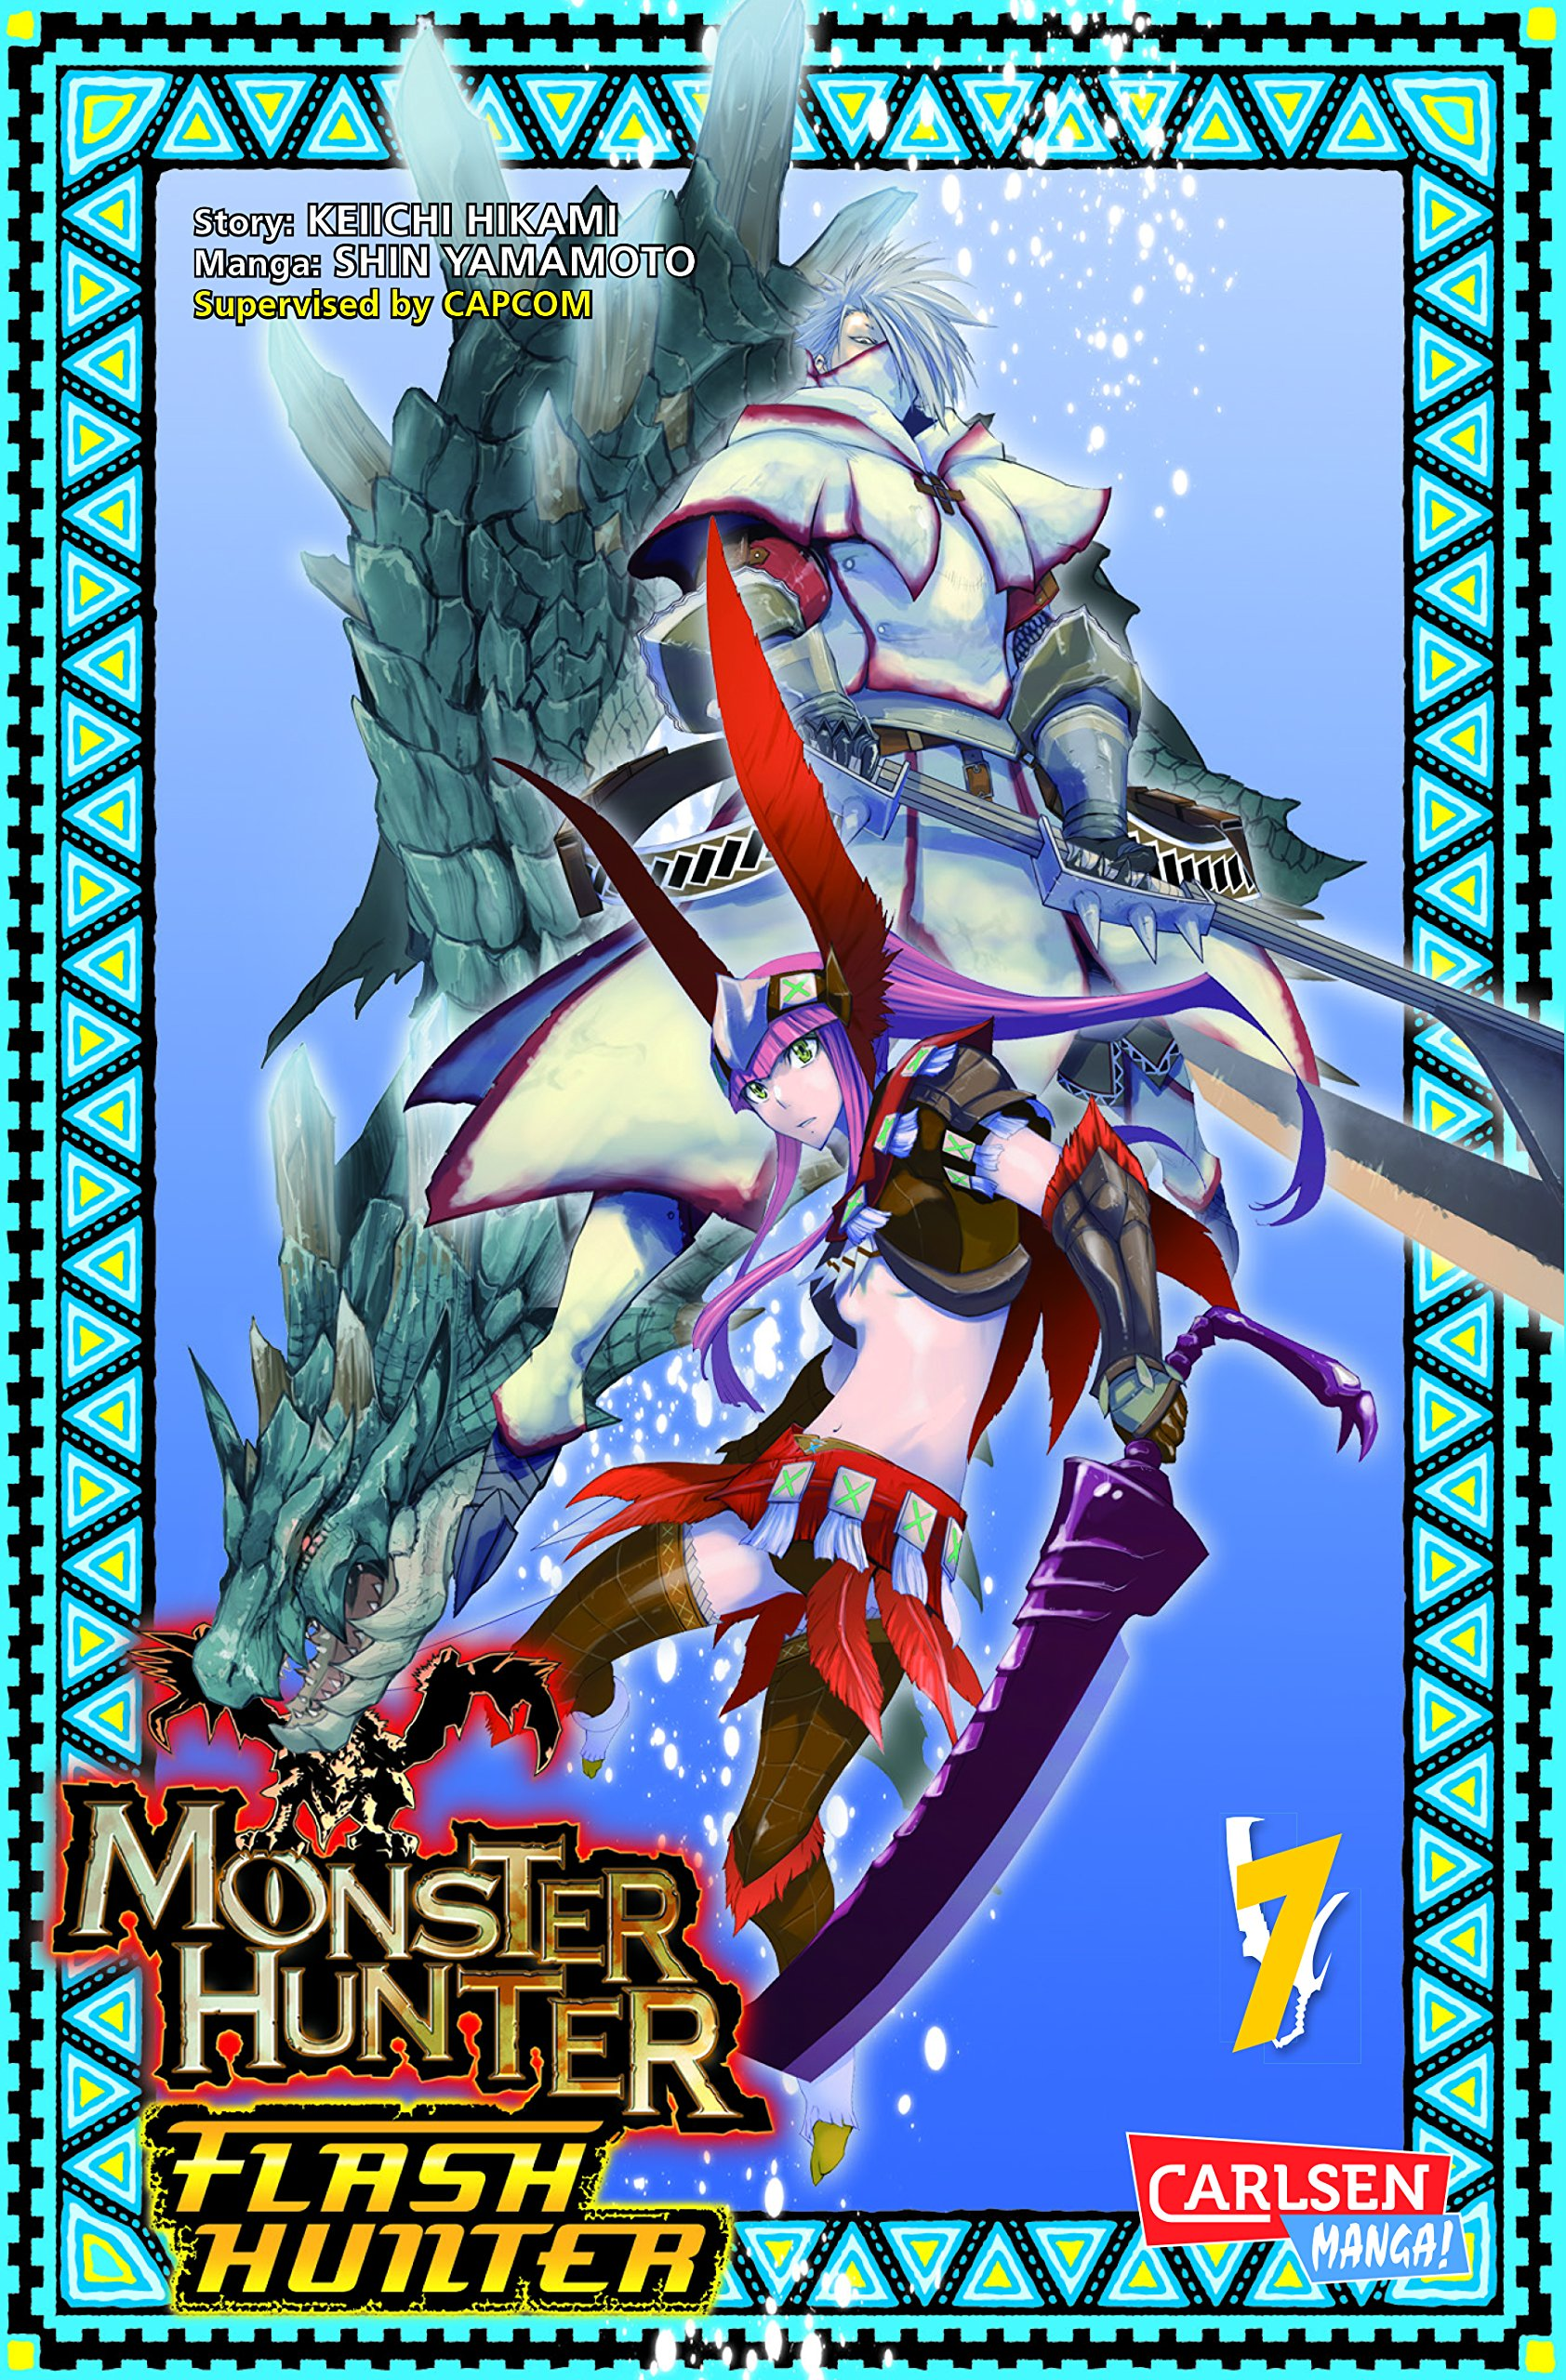 Monster Hunter Flash Hunter, Band 7